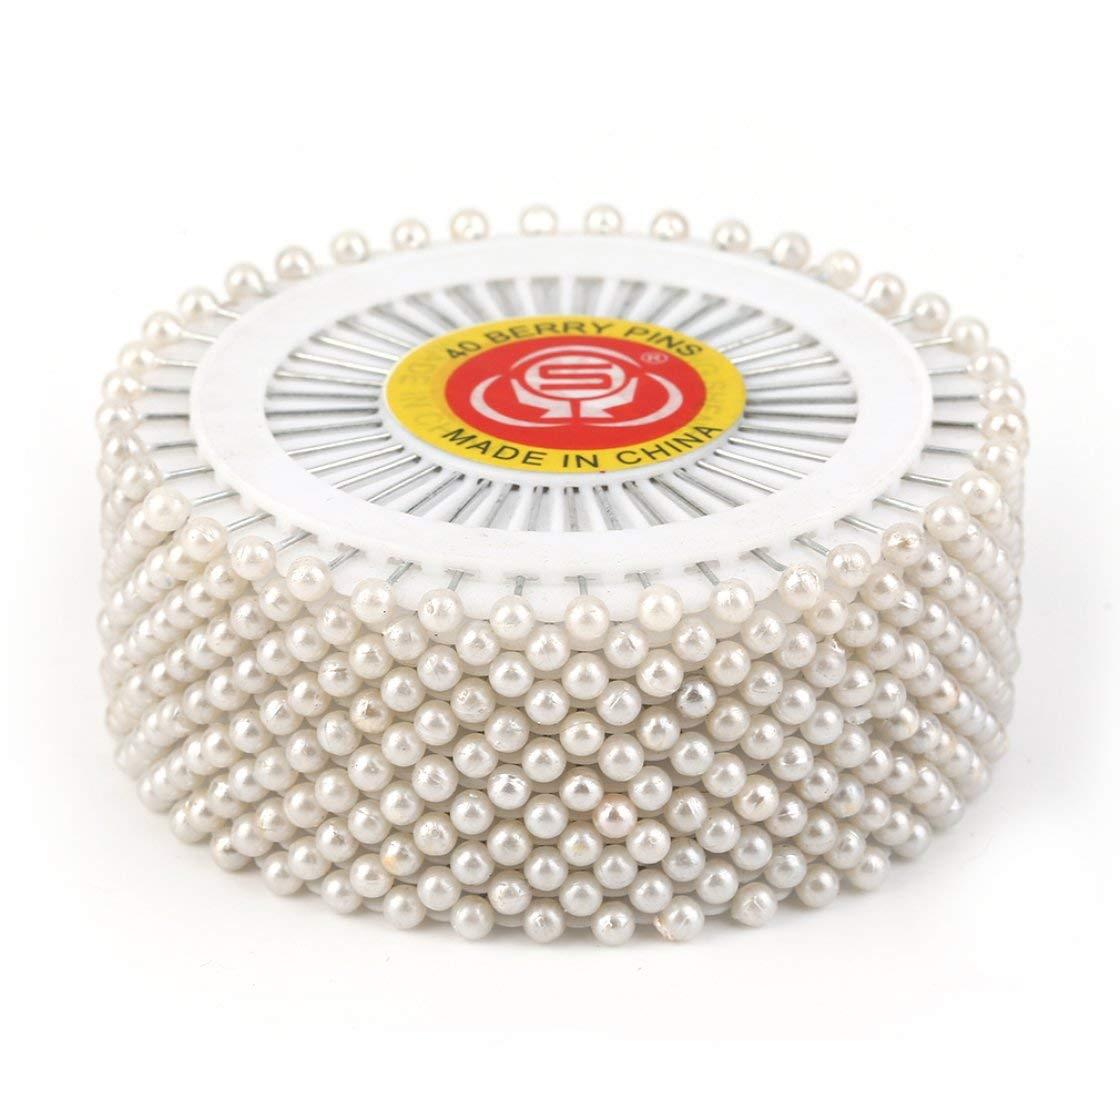 BlackPJenny 480Pcs Multi Round Pearl Head Dressmaking Pins Weddings Corsage Florists Sewing Tools Women Mini Ball Handmade Crafts Accessory